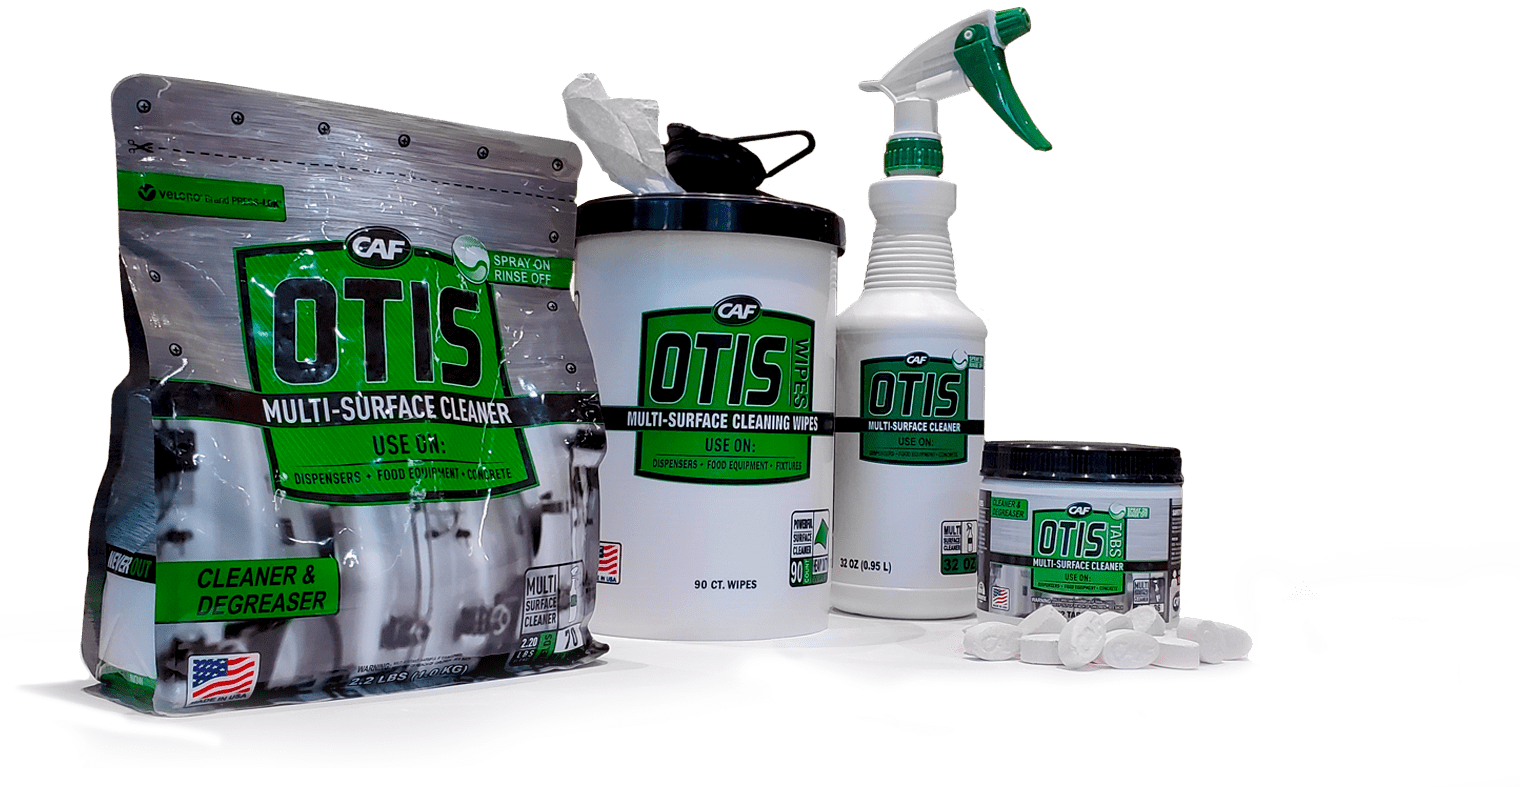 Otis multisurface cleaner lineup